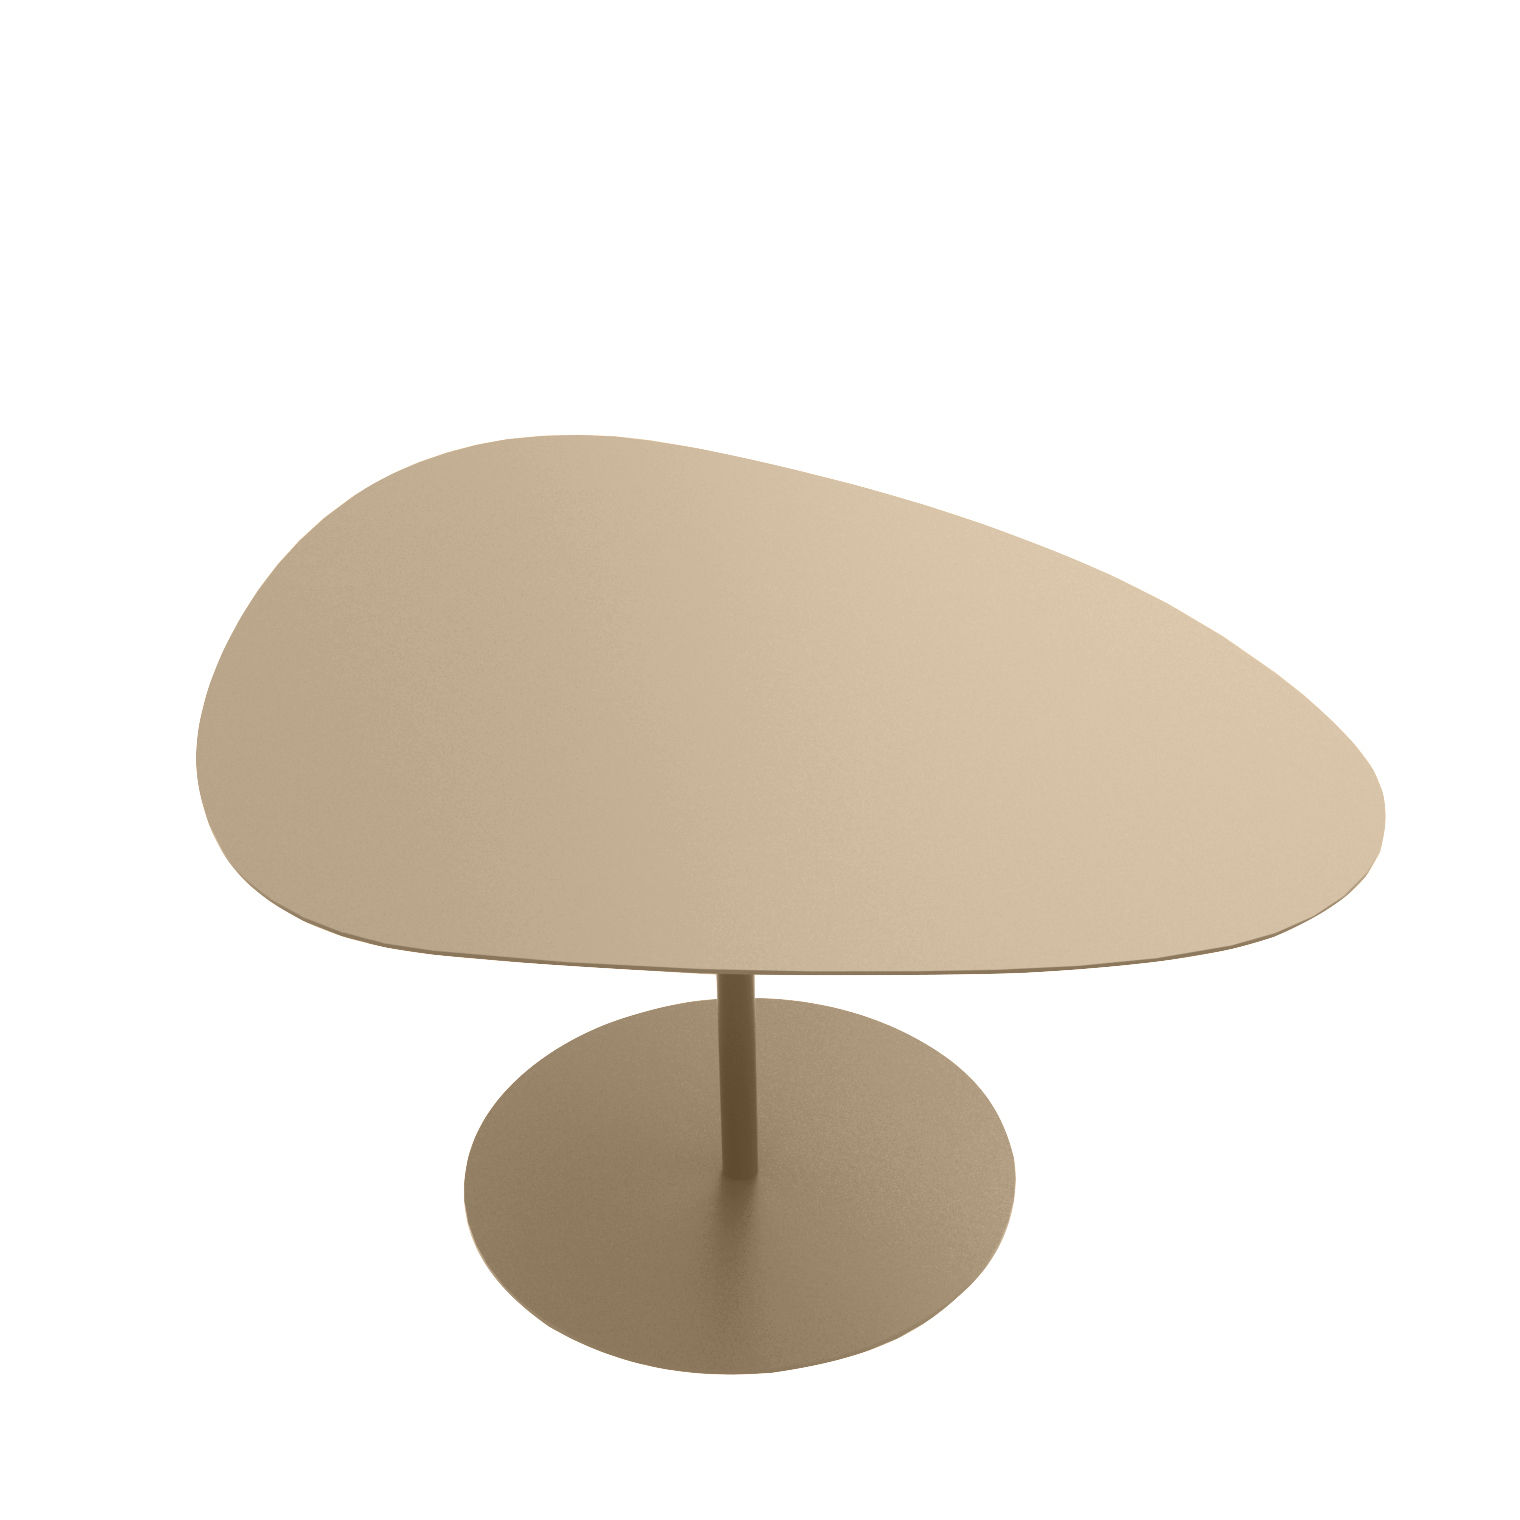 Mobilier - Tables basses - Table basse Galet n°2 / OUTDOOR - 58 x 75 - H 38,7 cm - Matière Grise - Sable - Aluminium